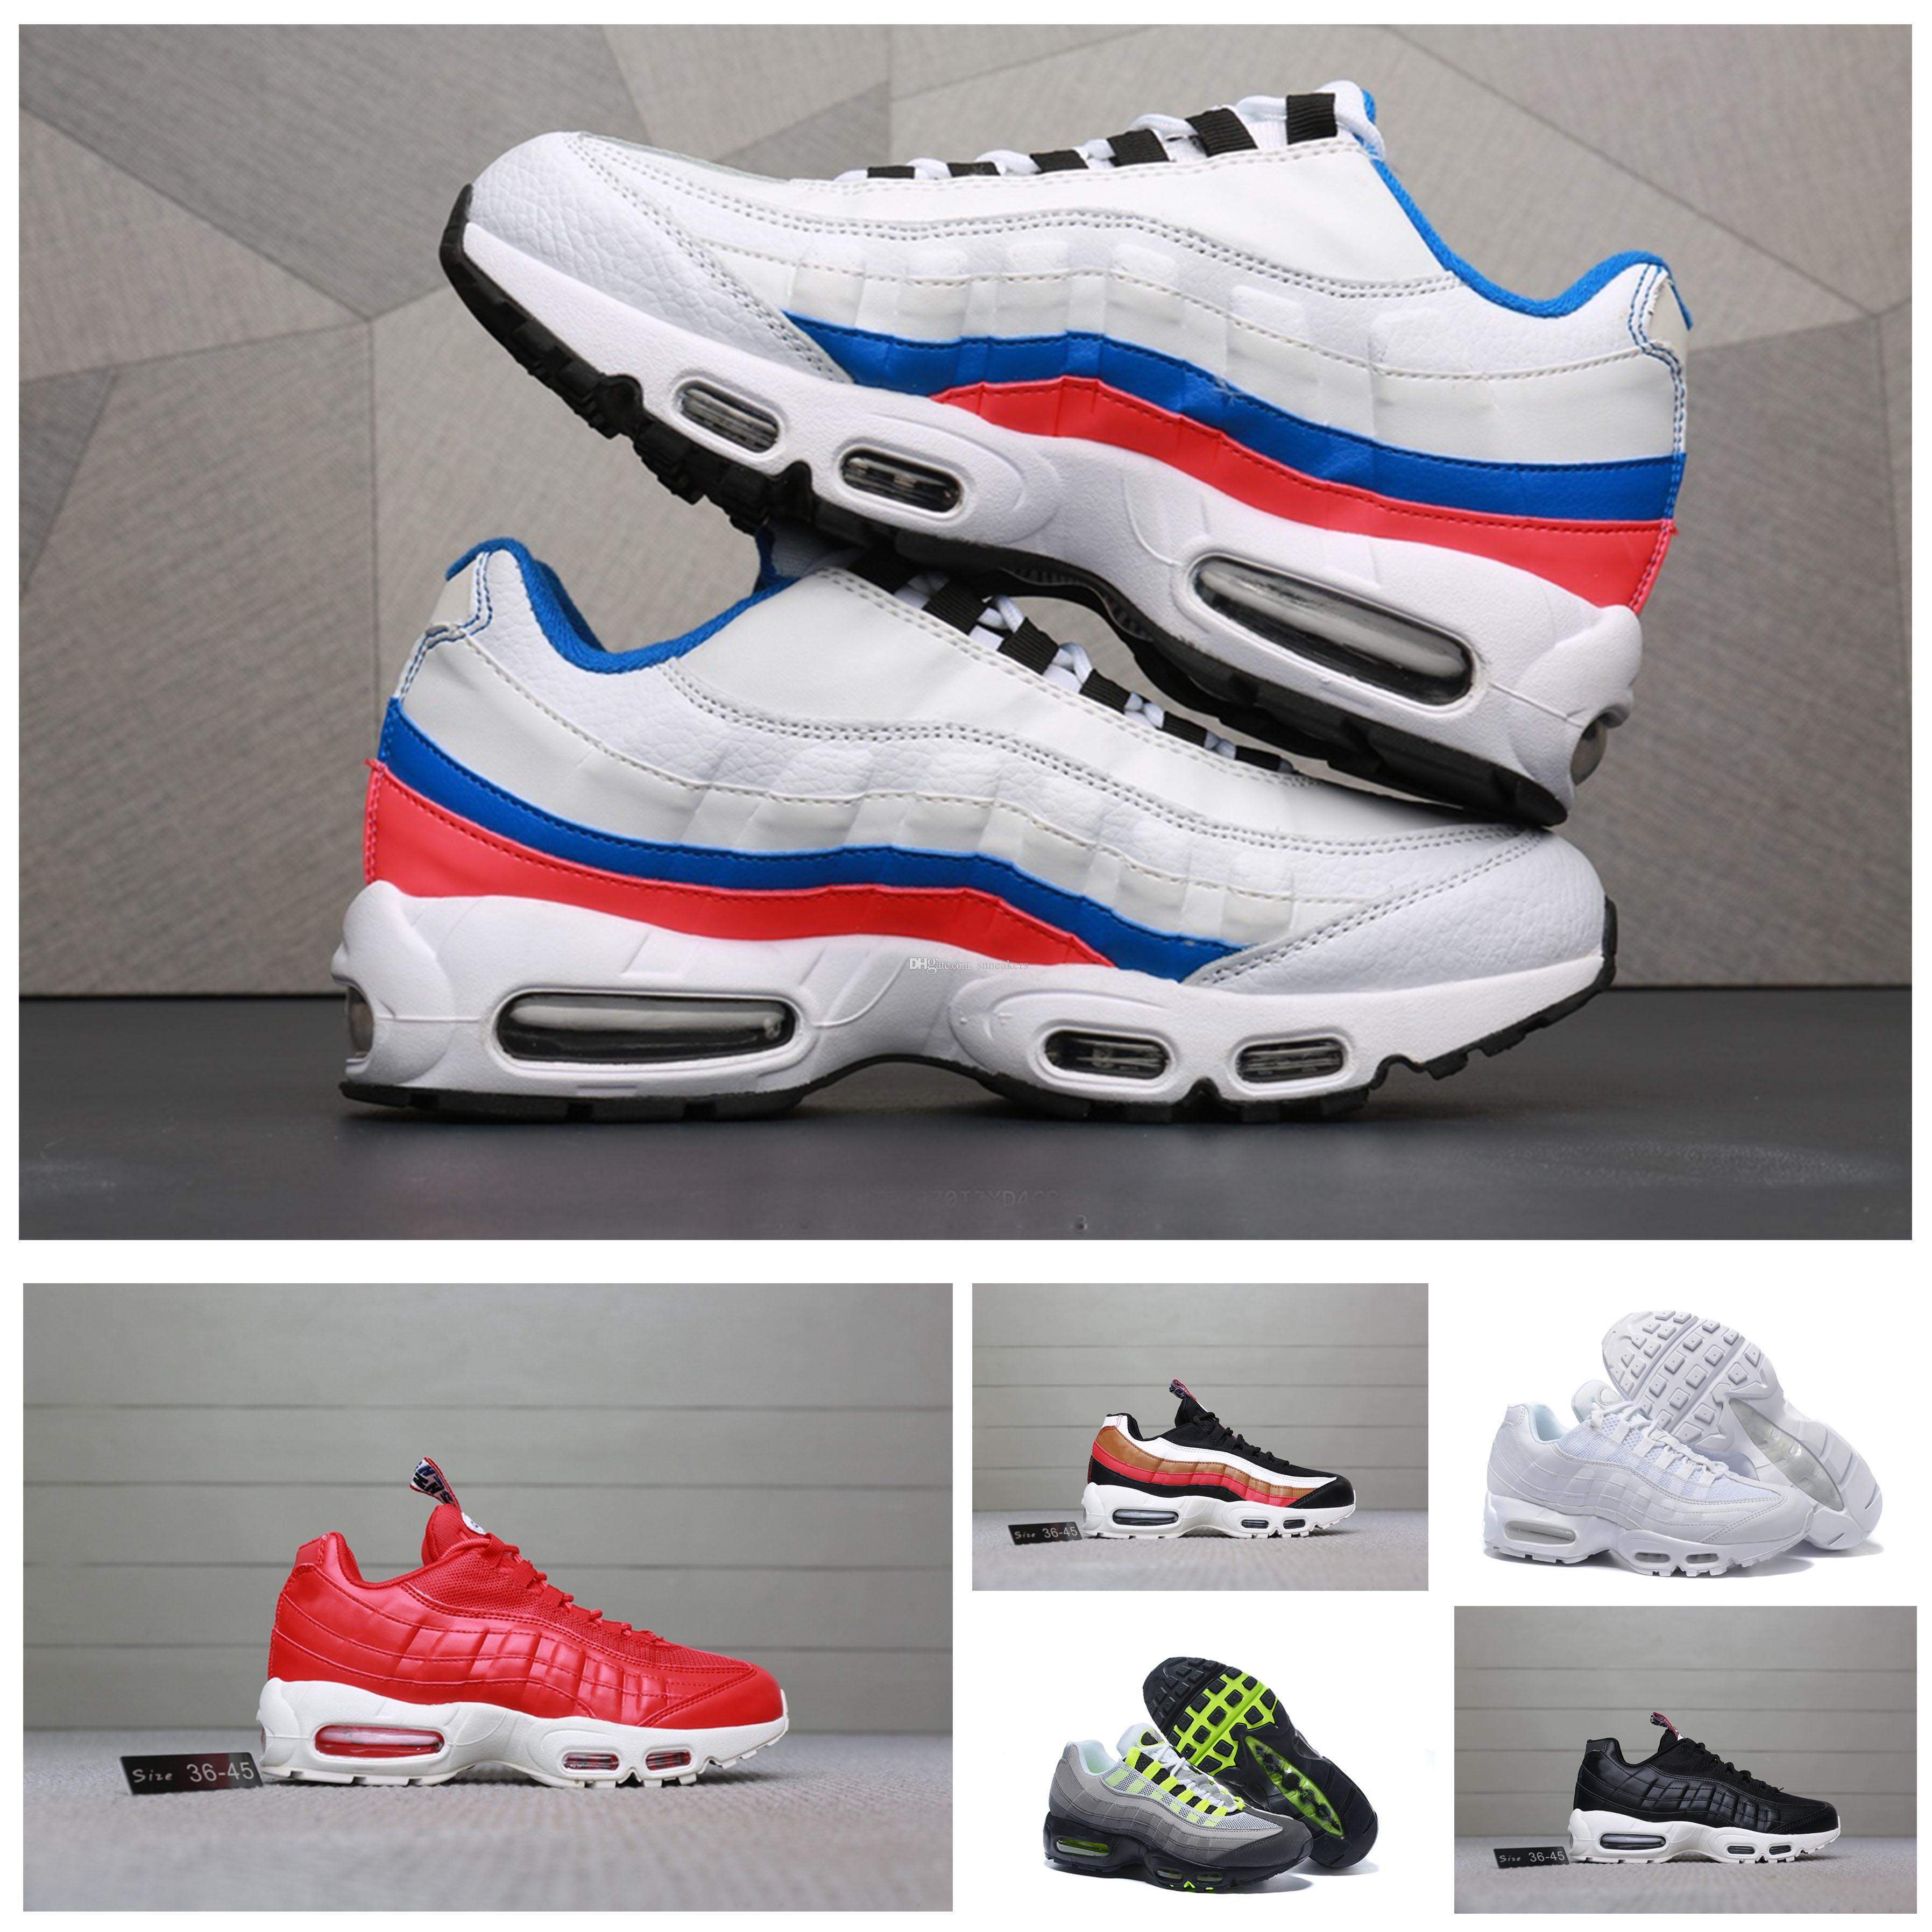 pretty nice d3044 81a0e Acheter Nike Air Max 95 New Air Ultra 20th Anniversary 95 Og Basketball  Chaussures Pour Hommes 95s Tennis Chaussures De Course Livraison Gratuite  Formateur ...